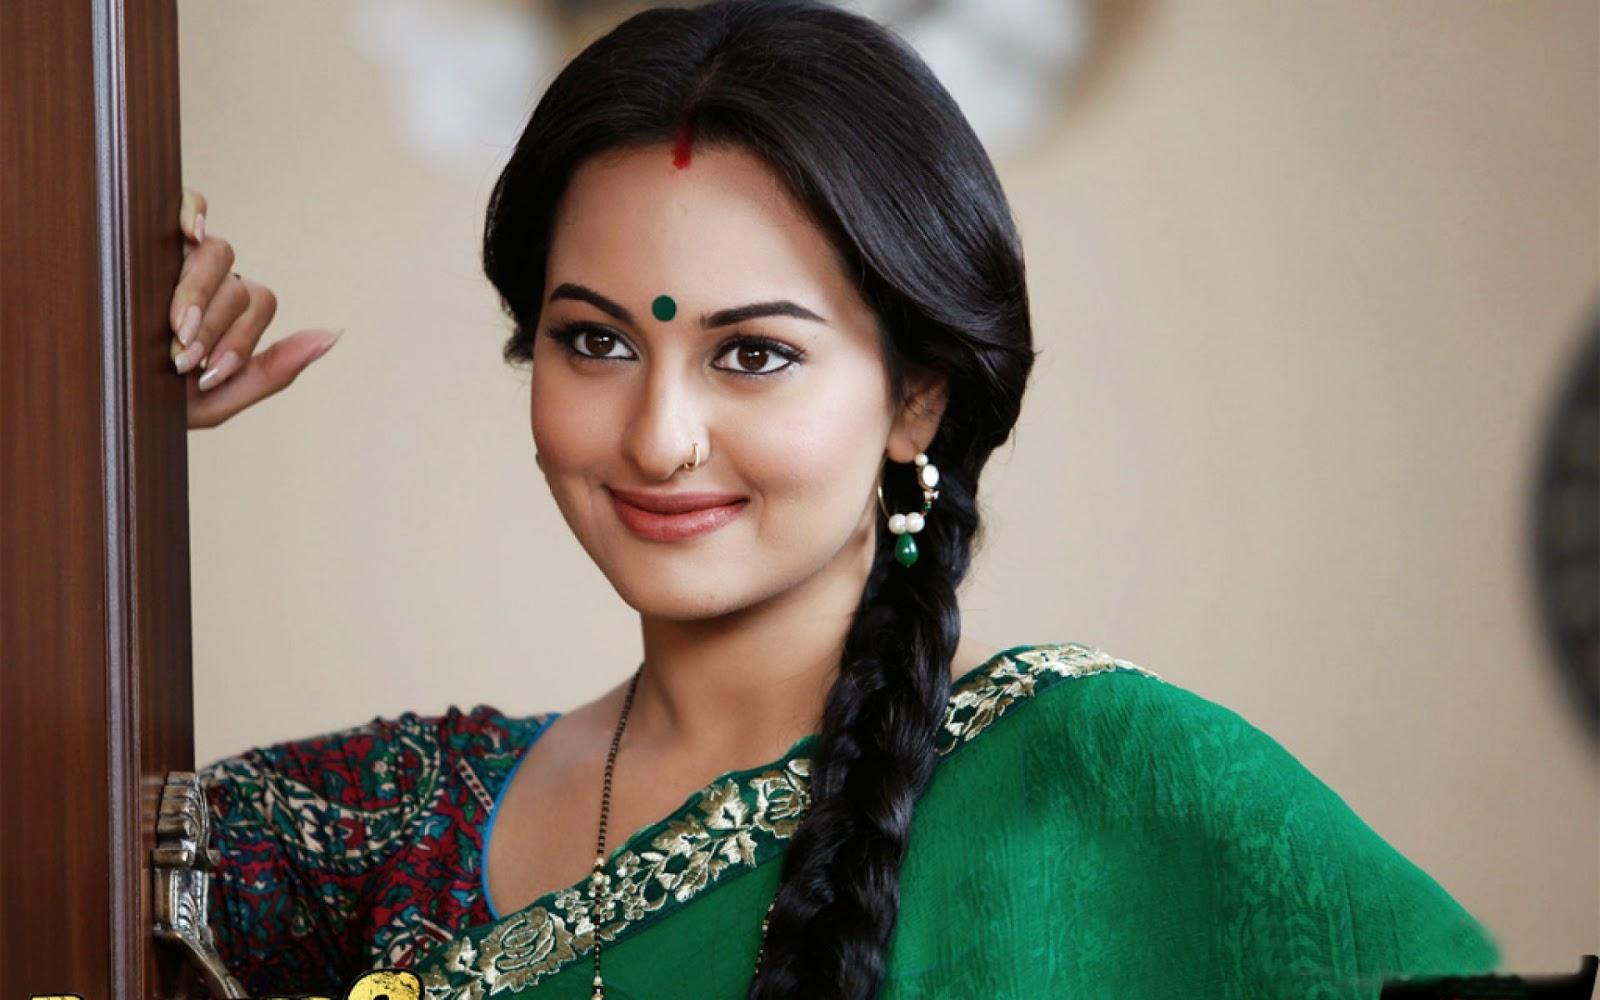 sonakshi sinha in green sarees wallpapers photos